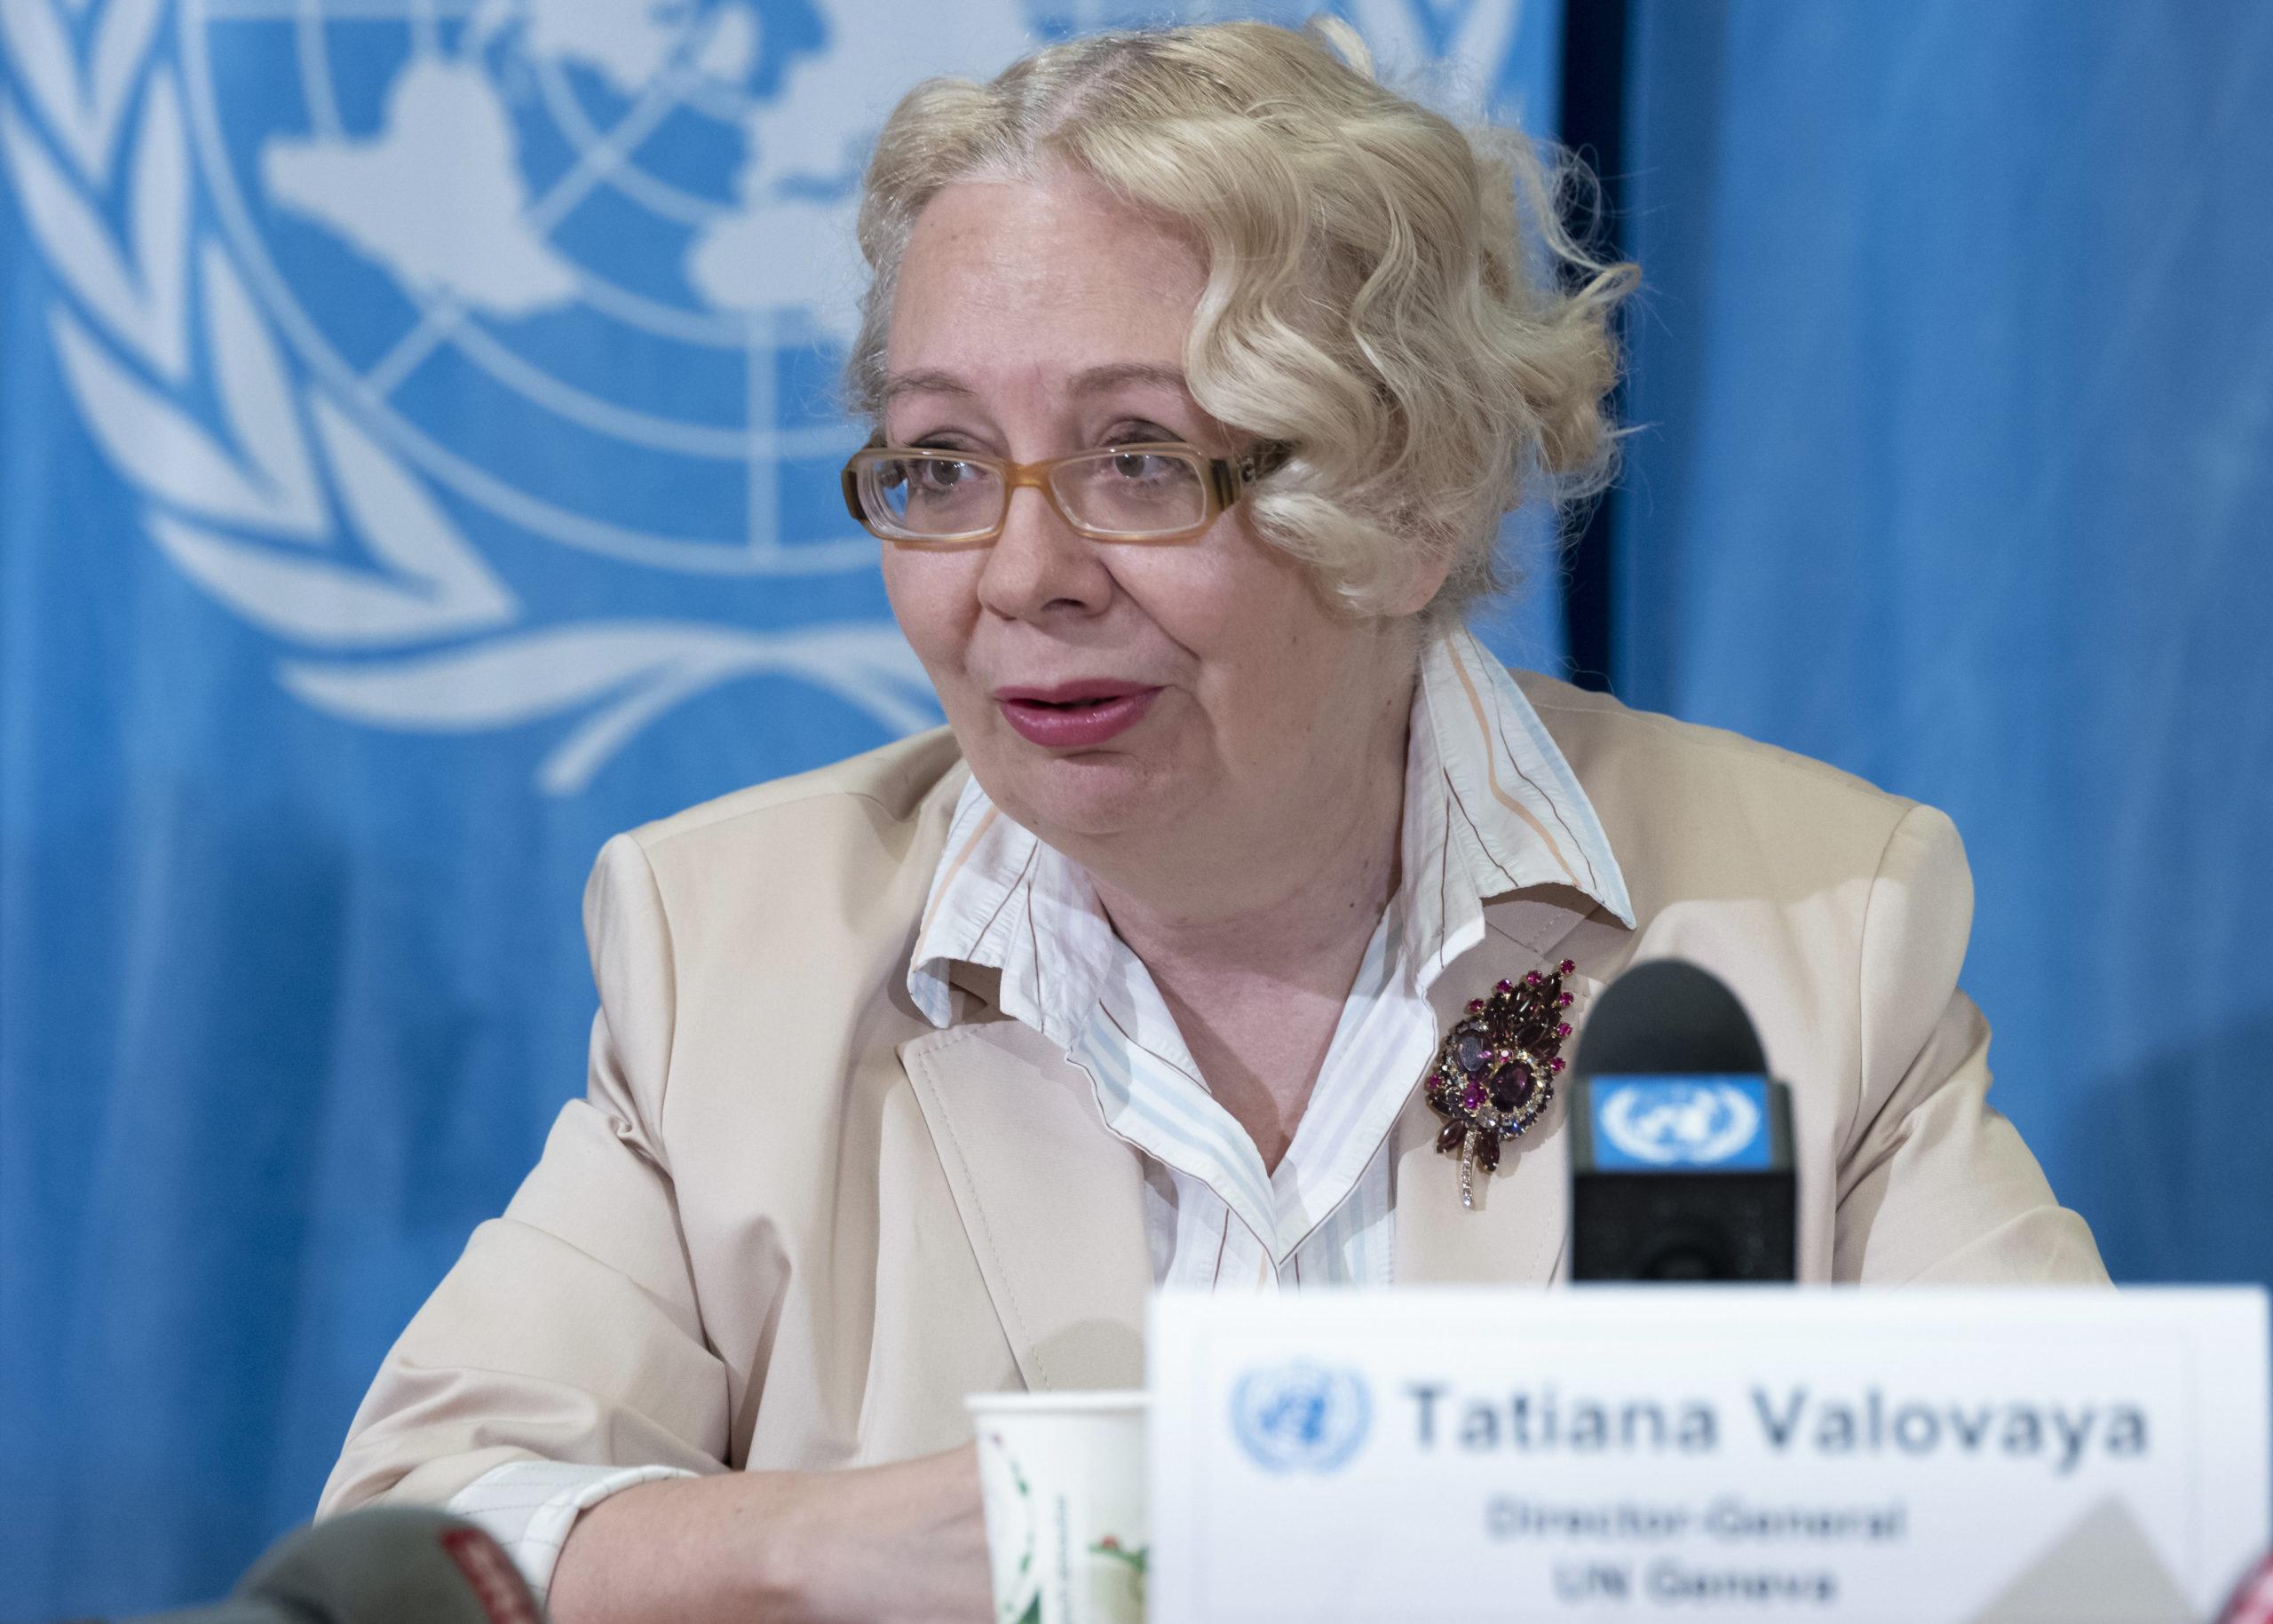 Tatiana Valovaya, Director-General of the United Nations Office at Geneva.